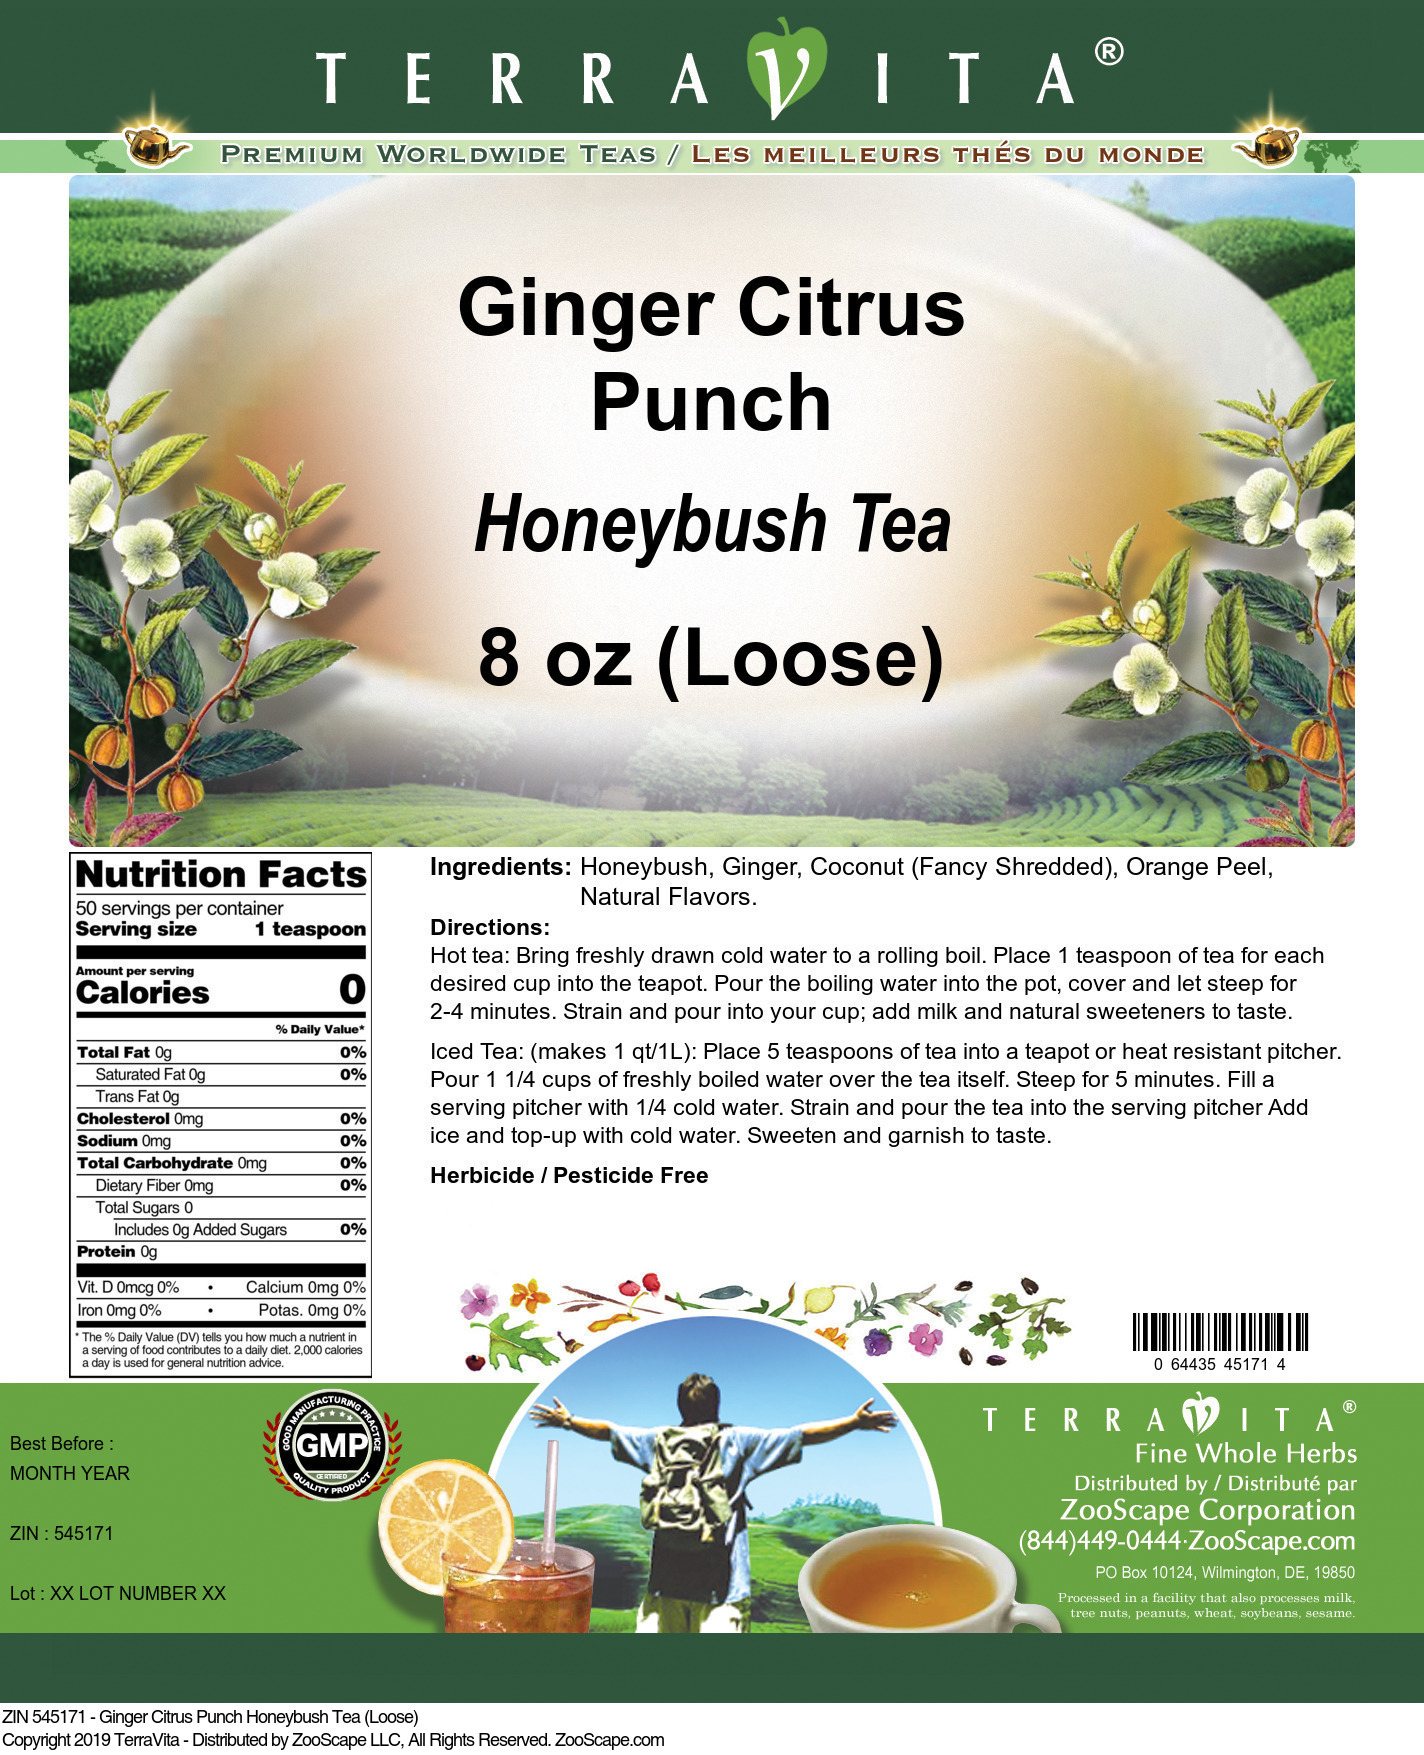 Ginger Citrus Punch Honeybush Tea (Loose)